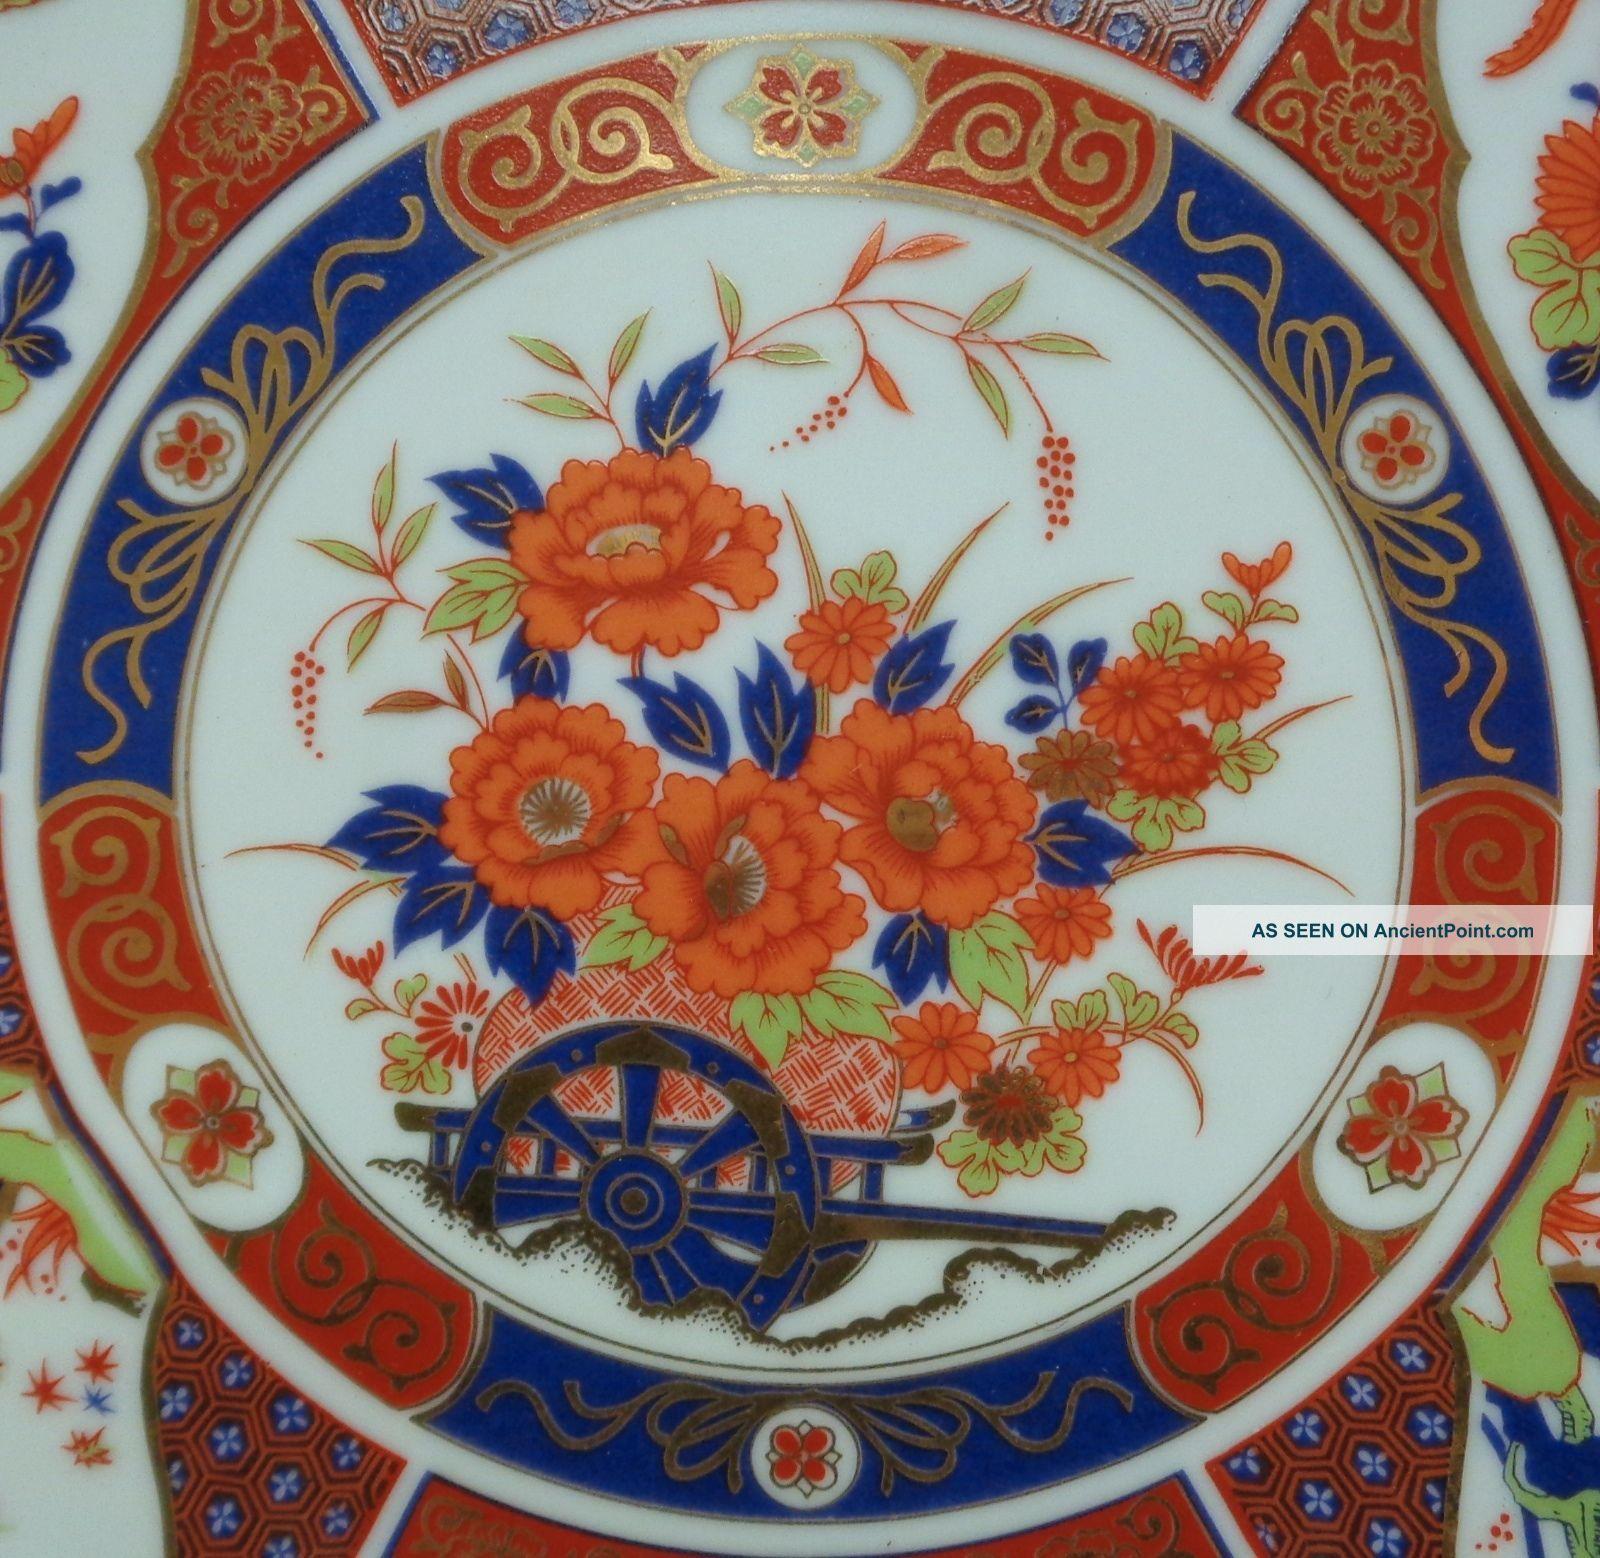 Japanese Antique Decor Plate W Intricate Floral/ Bird Designs u0026 Gold Highlights & Japanese Antique Decor Plate W Intricate Floral/ Bird Designs u0026 Gold ...